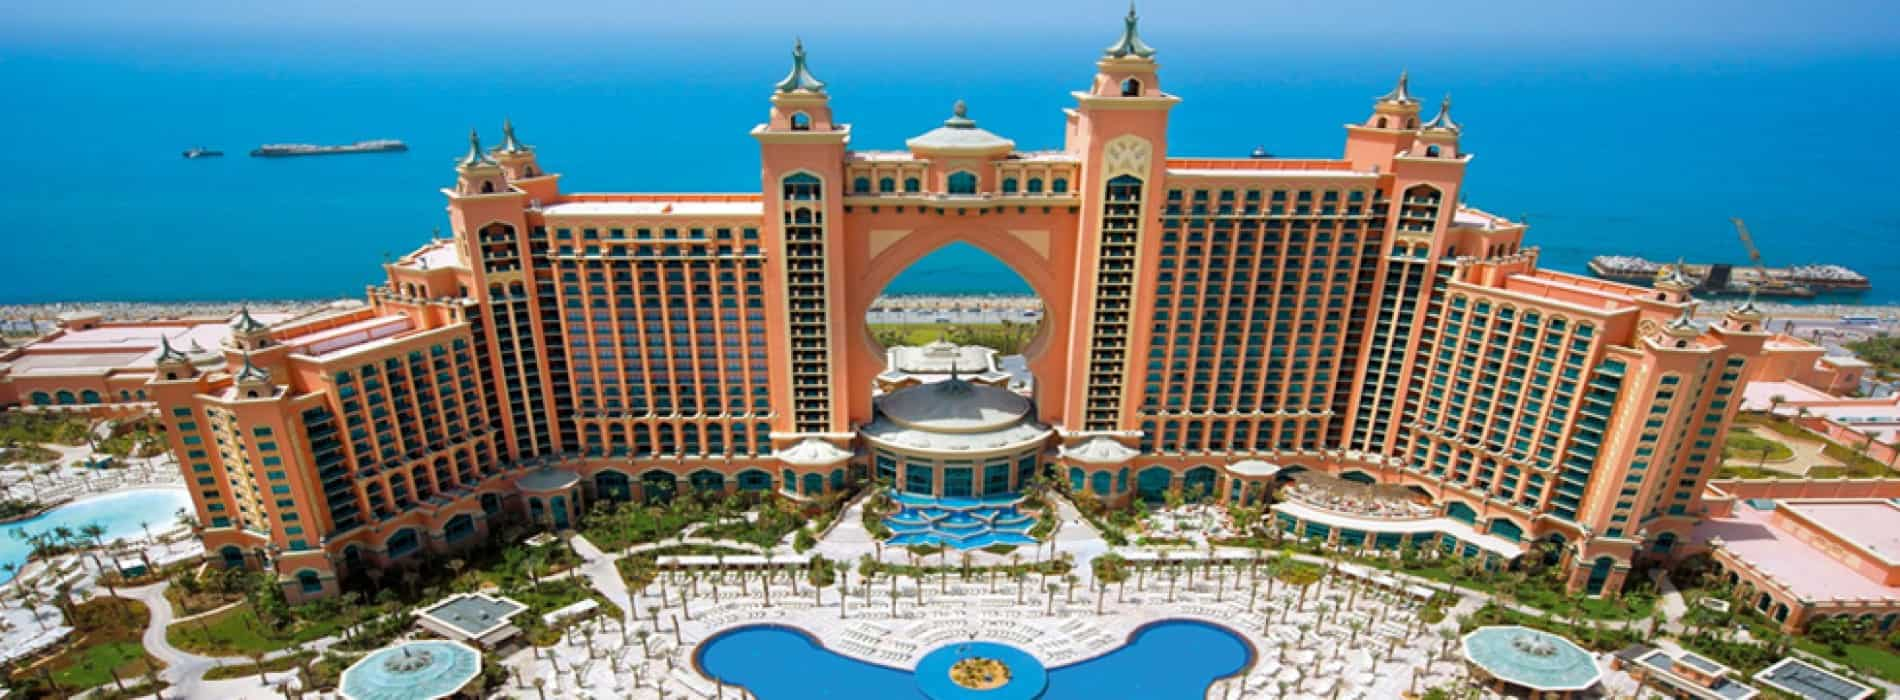 The Palm - hotel Atlantis